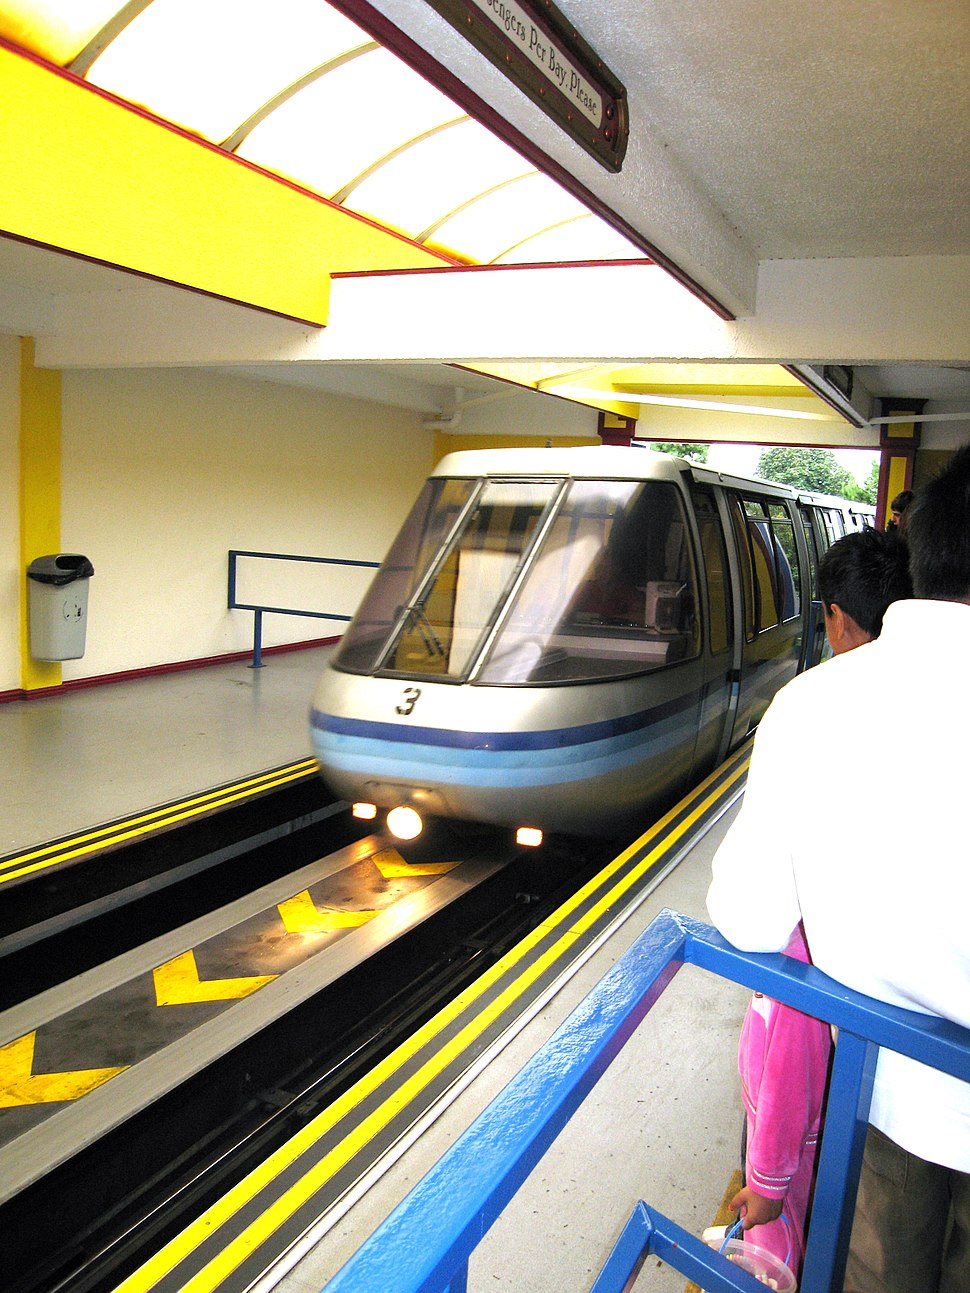 Alton Towers Monorail